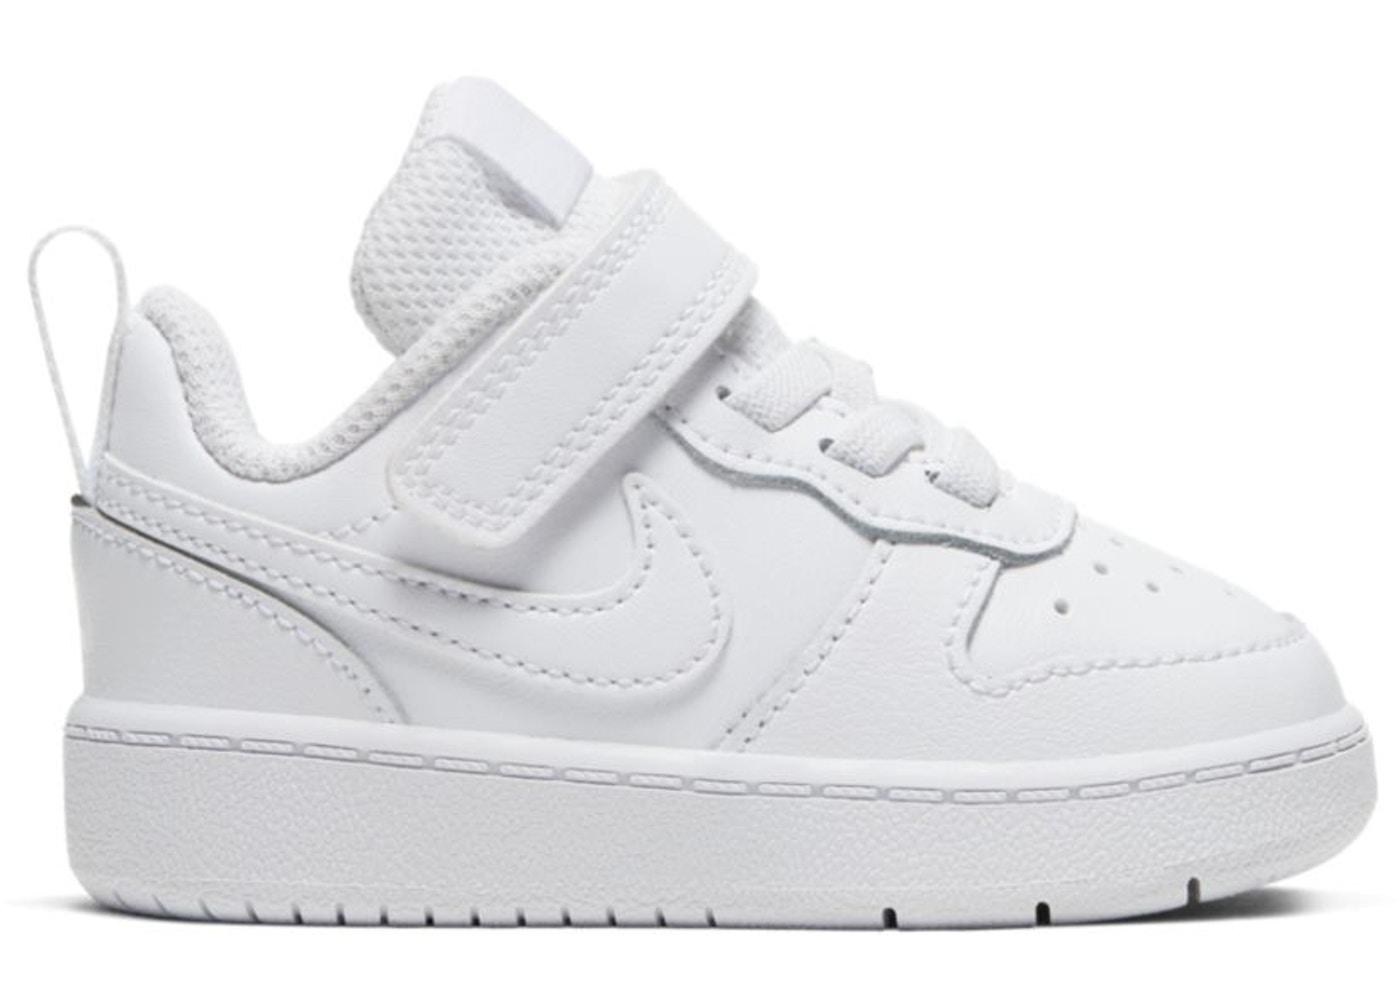 Nike Court Borough Low 2 Scarpe da Ginnastica Unisex Bambini BQ5453-100WHITE/WHITE  -8